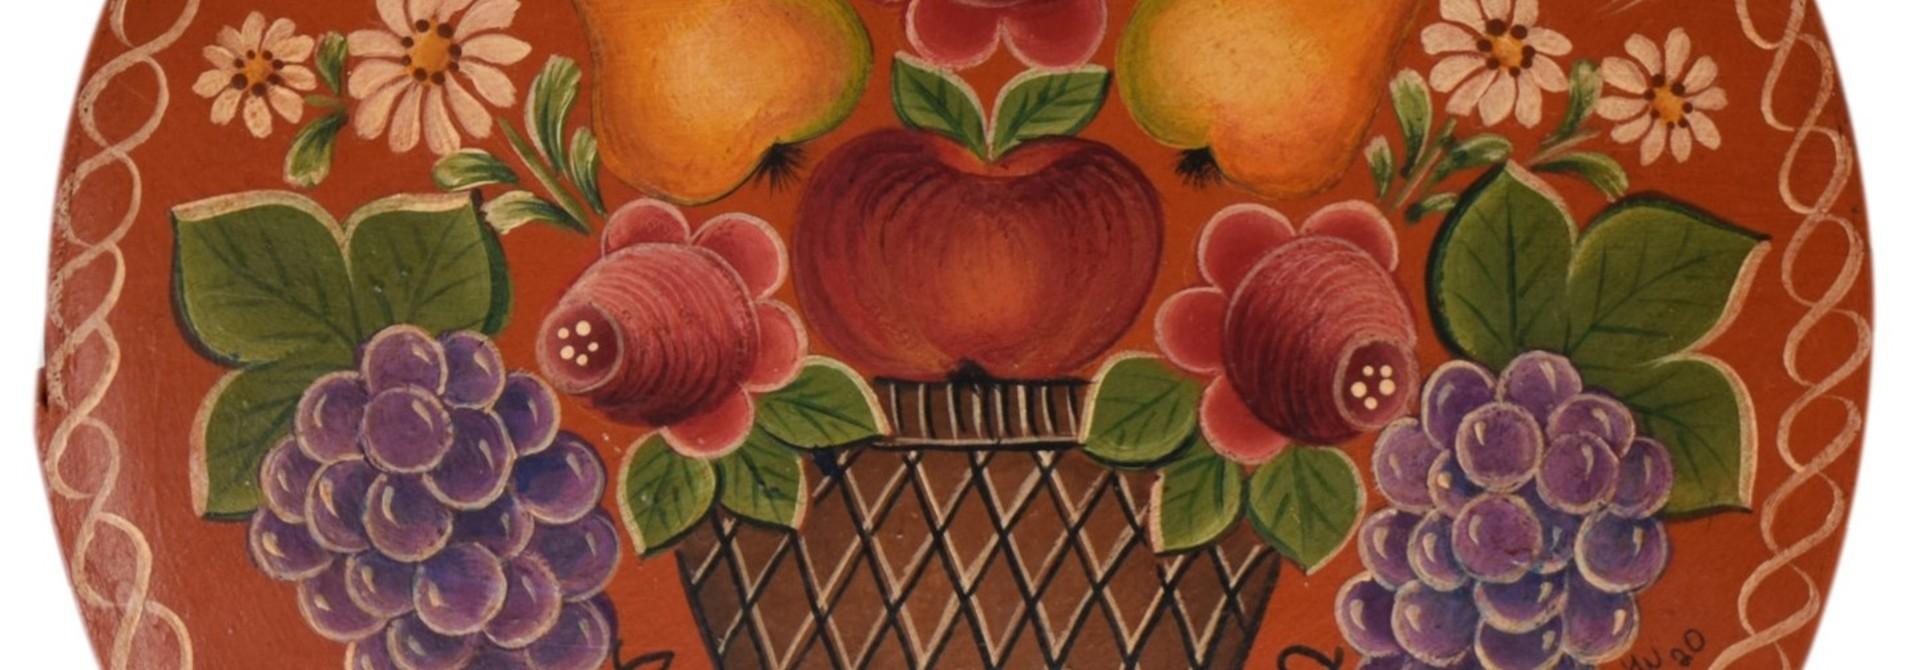 Round Box dark orange with basket, pears, and flowers